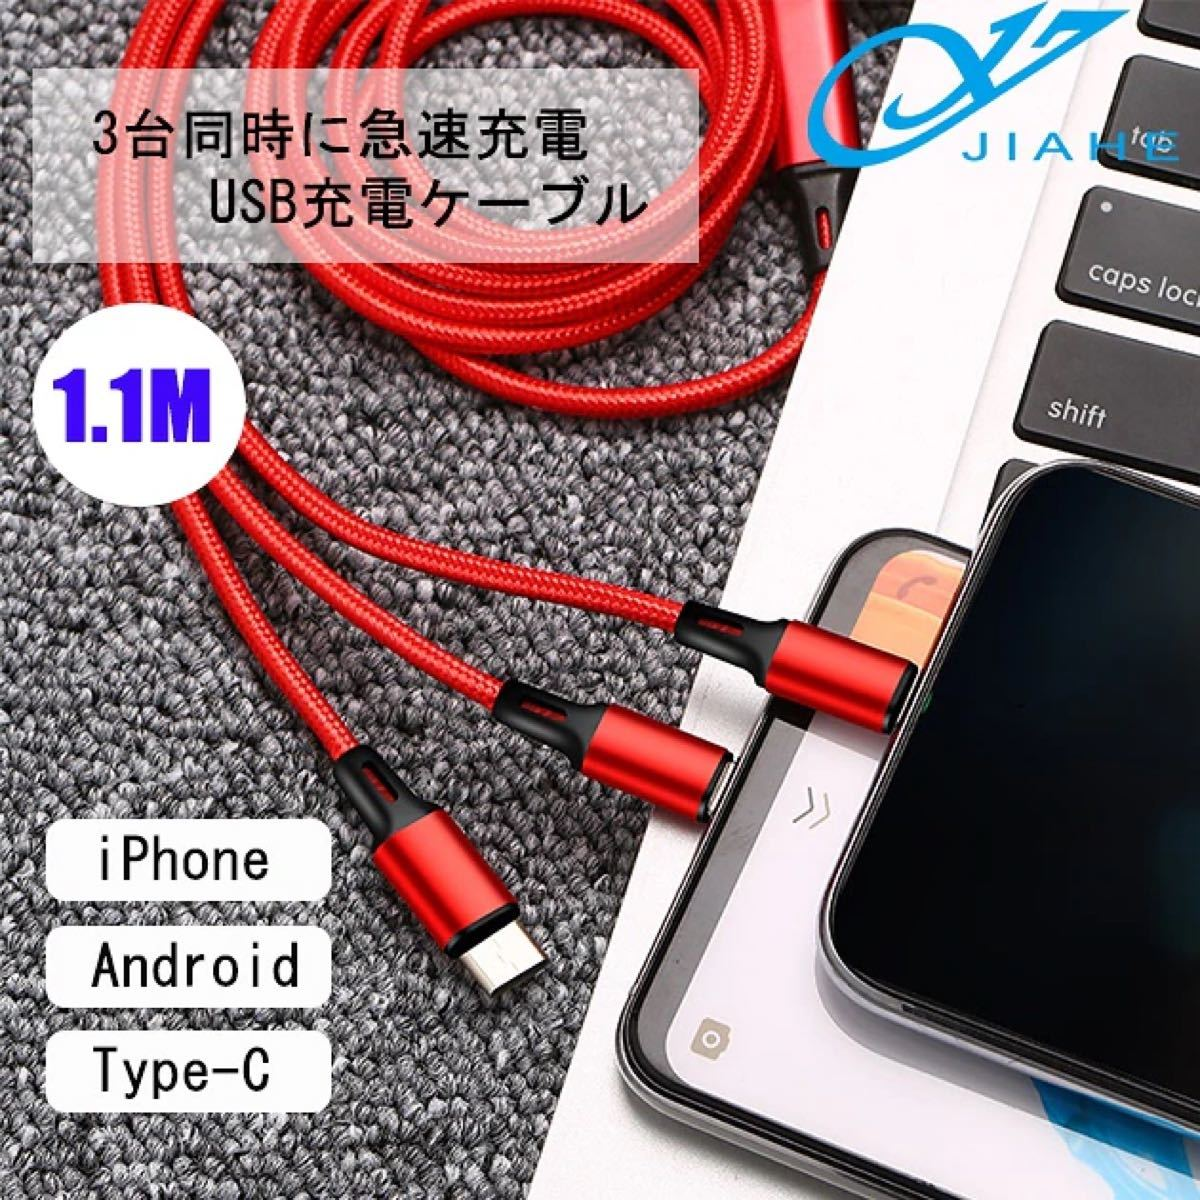 1.1m ケーブル 3in1 急速充電ケーブル ナイロン 断線防止 iPhone Type-C Micro USB 3台同時充電